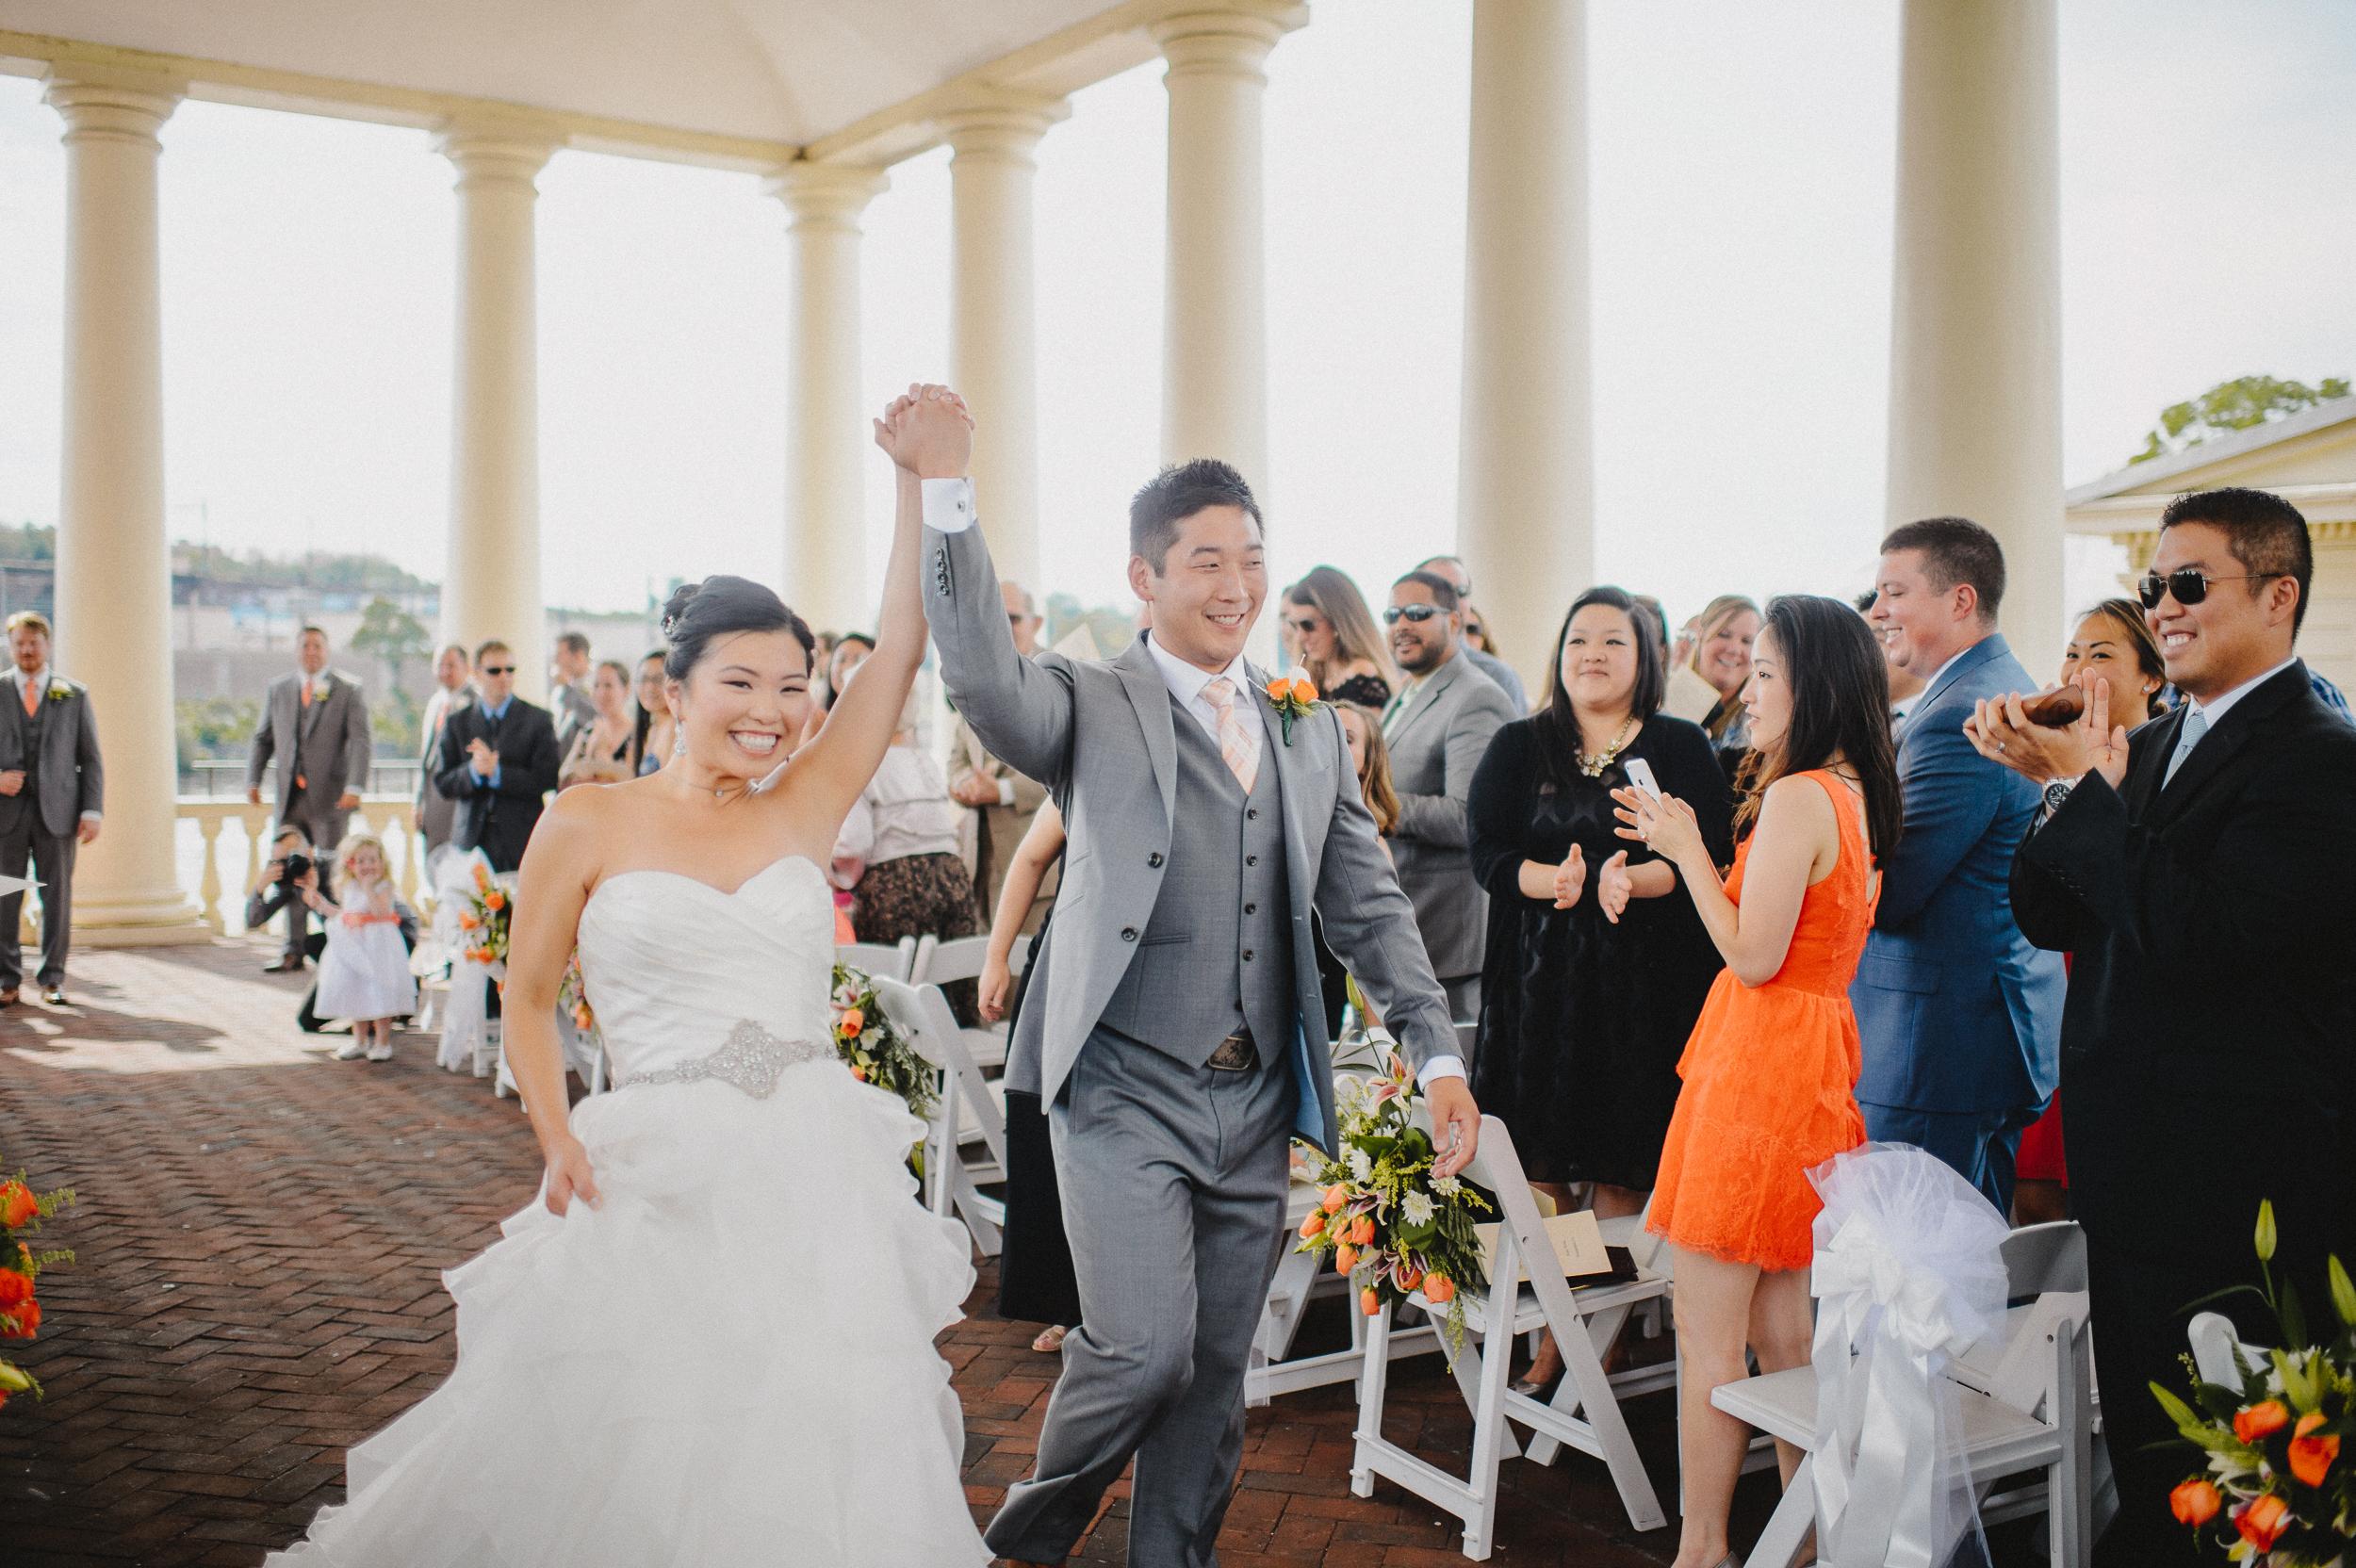 union-trust-philadelphia-wedding-photographer-46.jpg